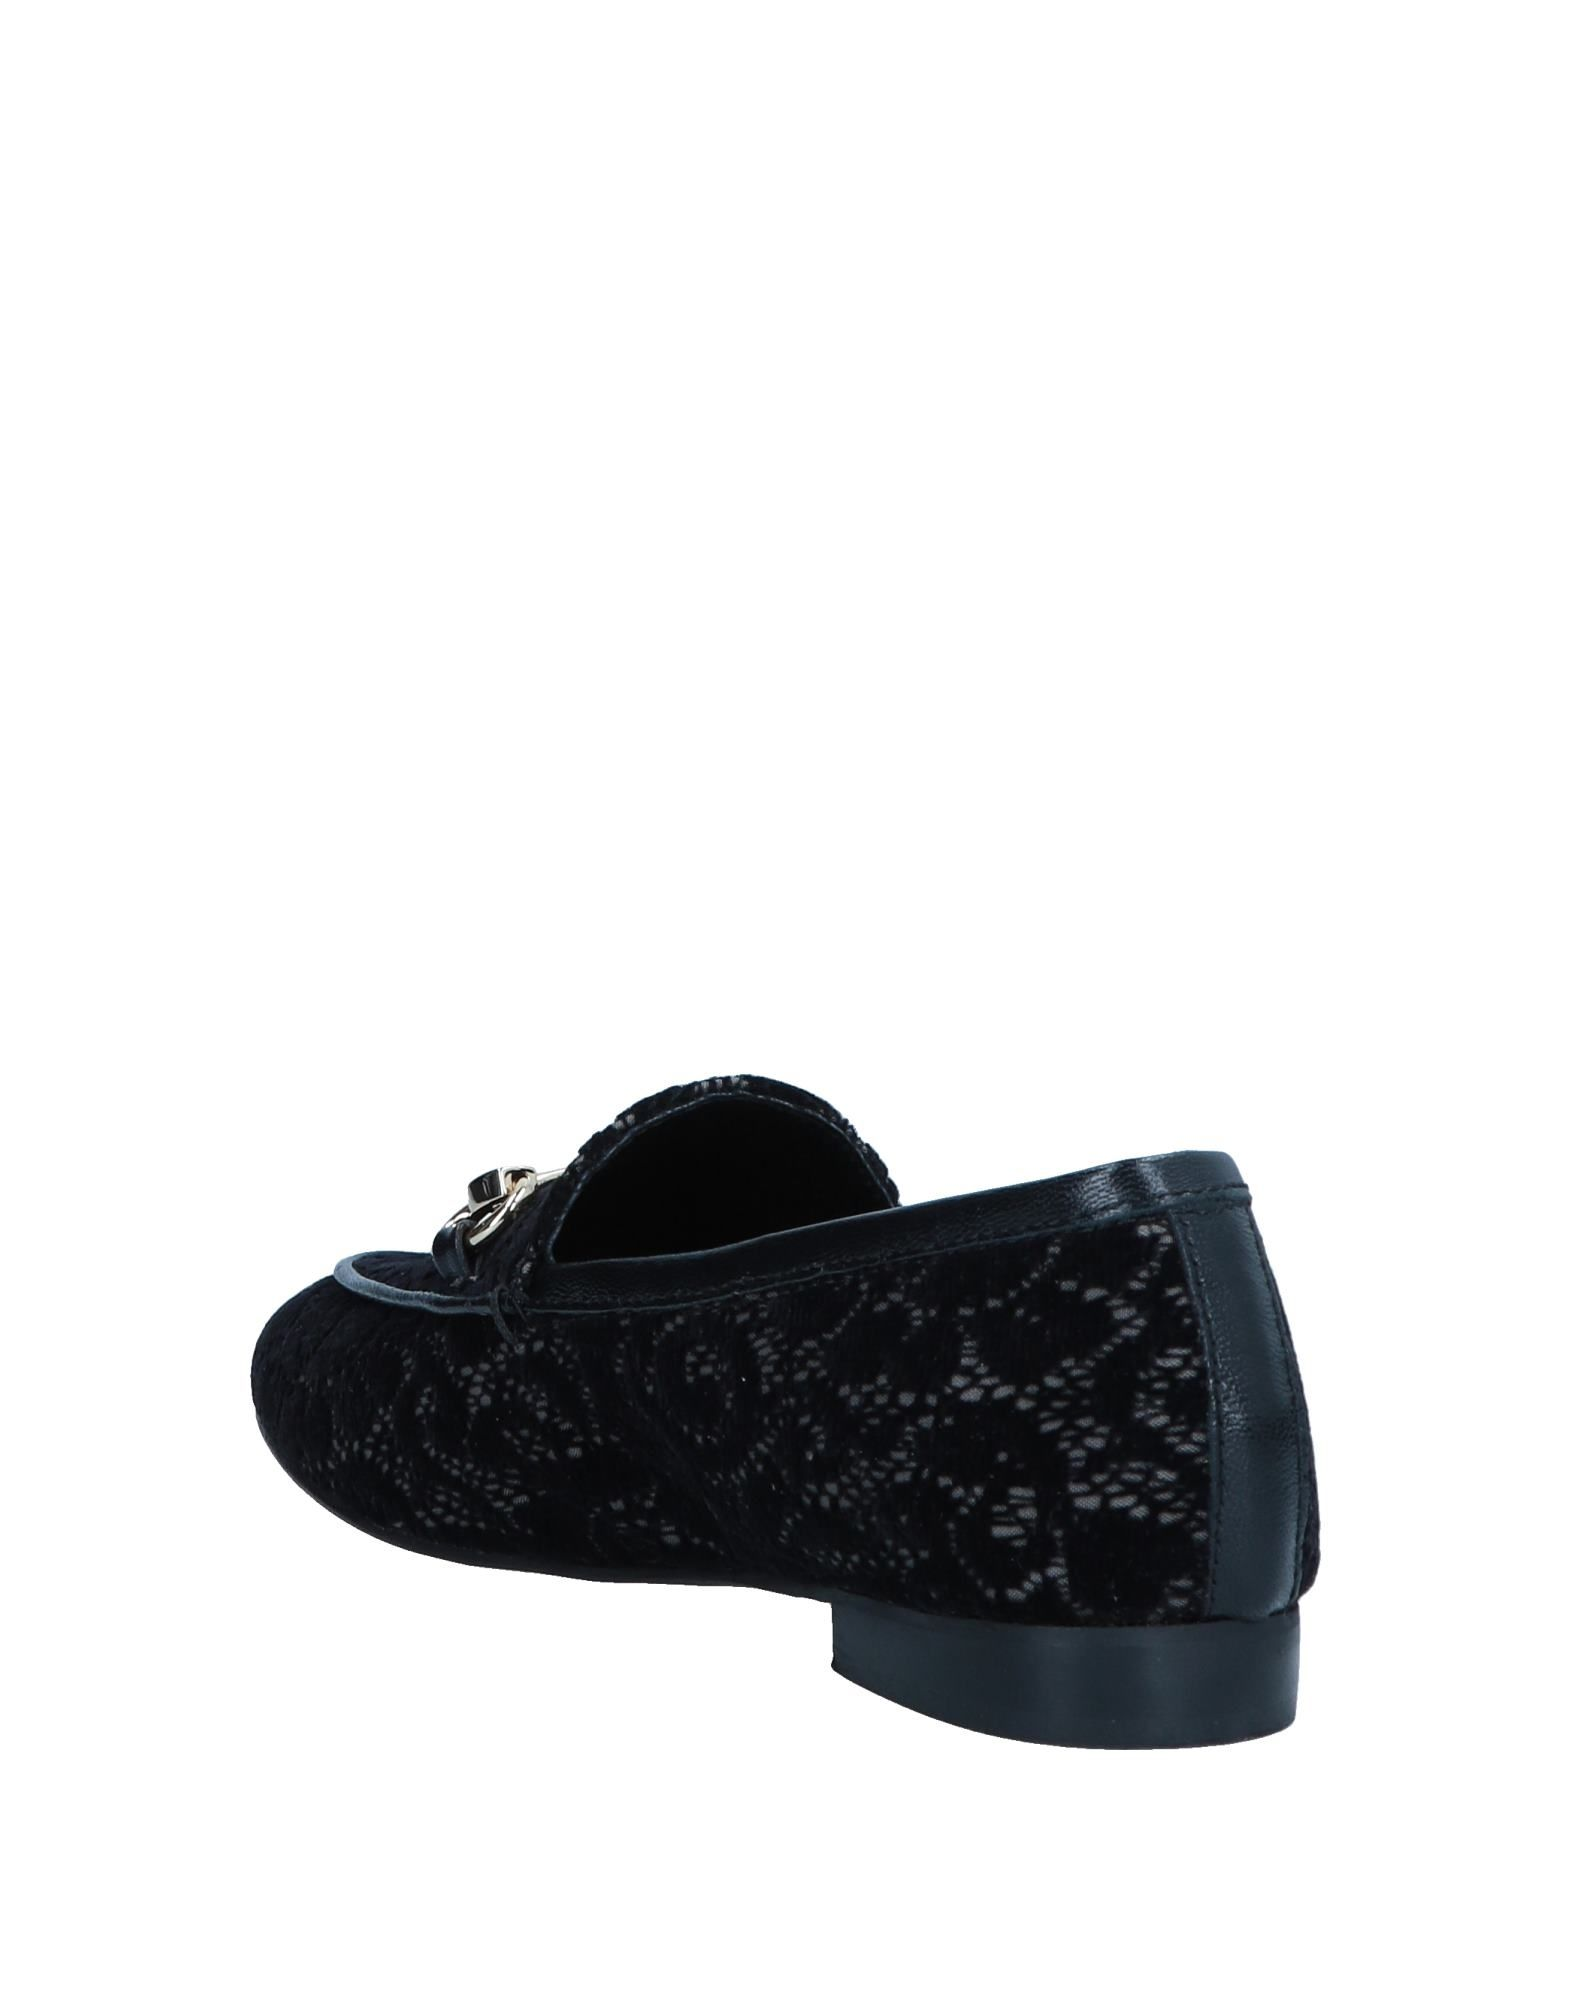 Ovye' By Cristina Qualität Lucchi Mokassins Damen  11565116BS Gute Qualität Cristina beliebte Schuhe 698ec3